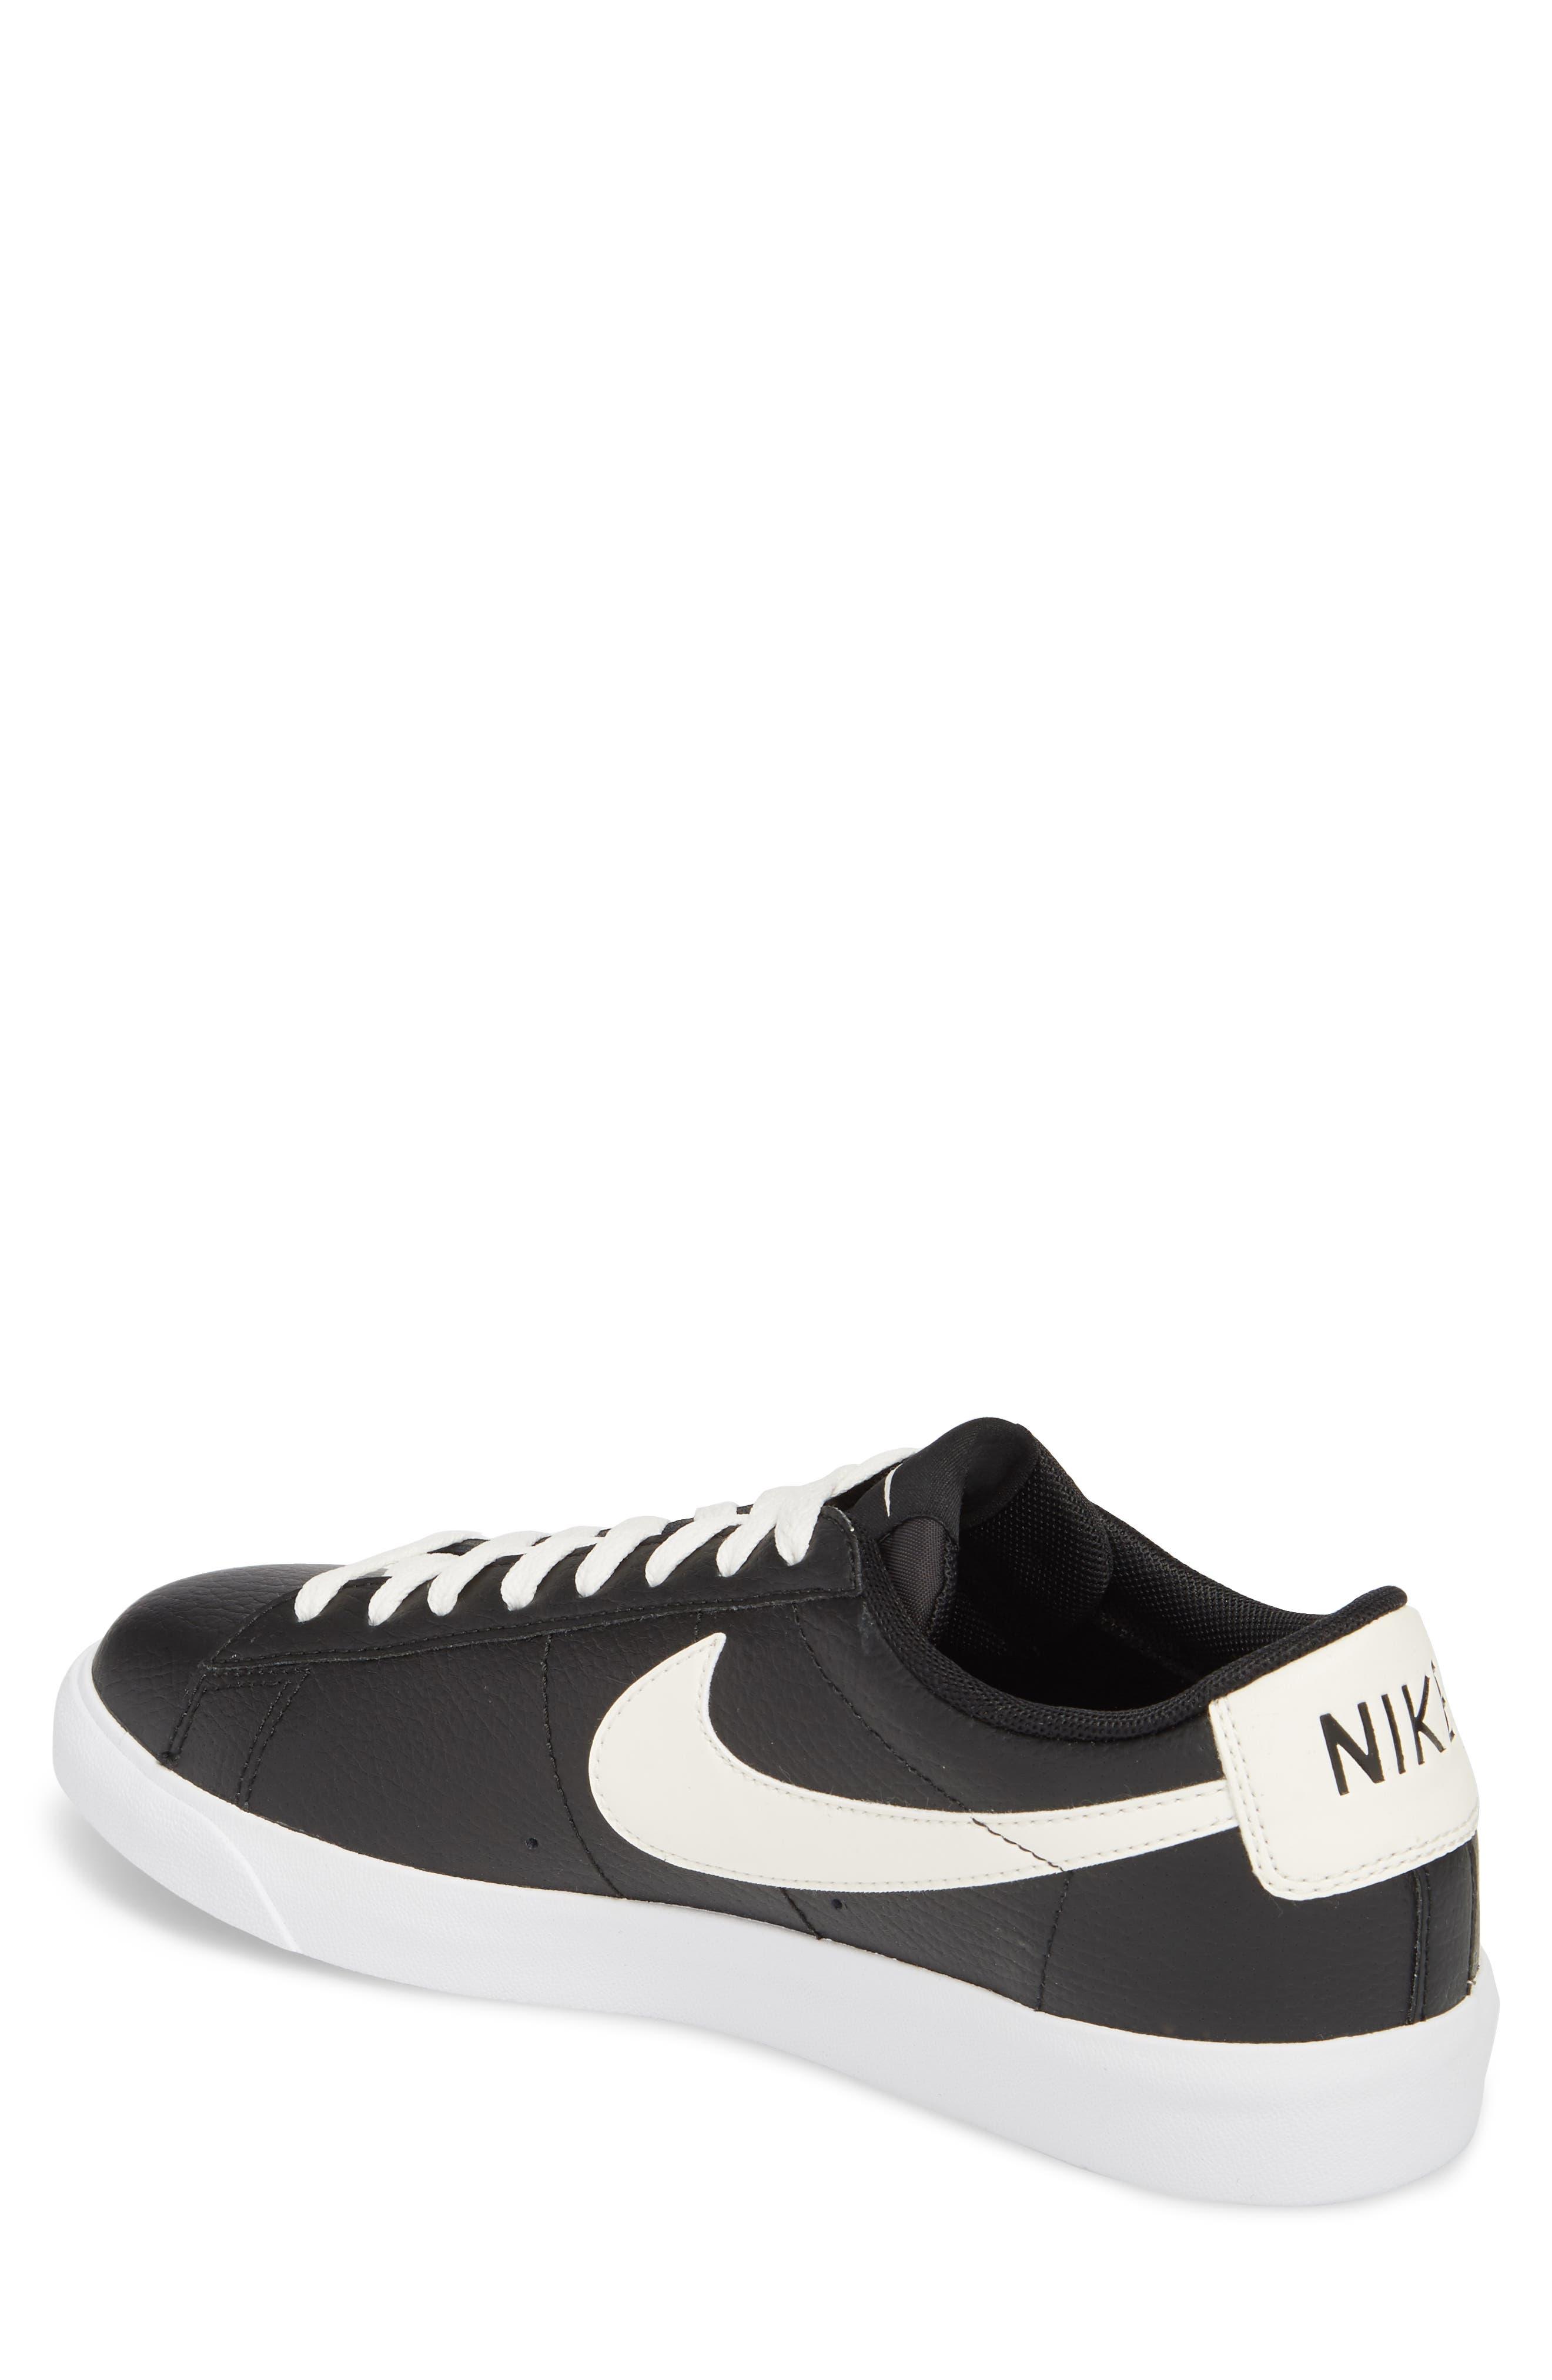 Blazer Low Leather Sneaker,                             Alternate thumbnail 2, color,                             Black/ Sail